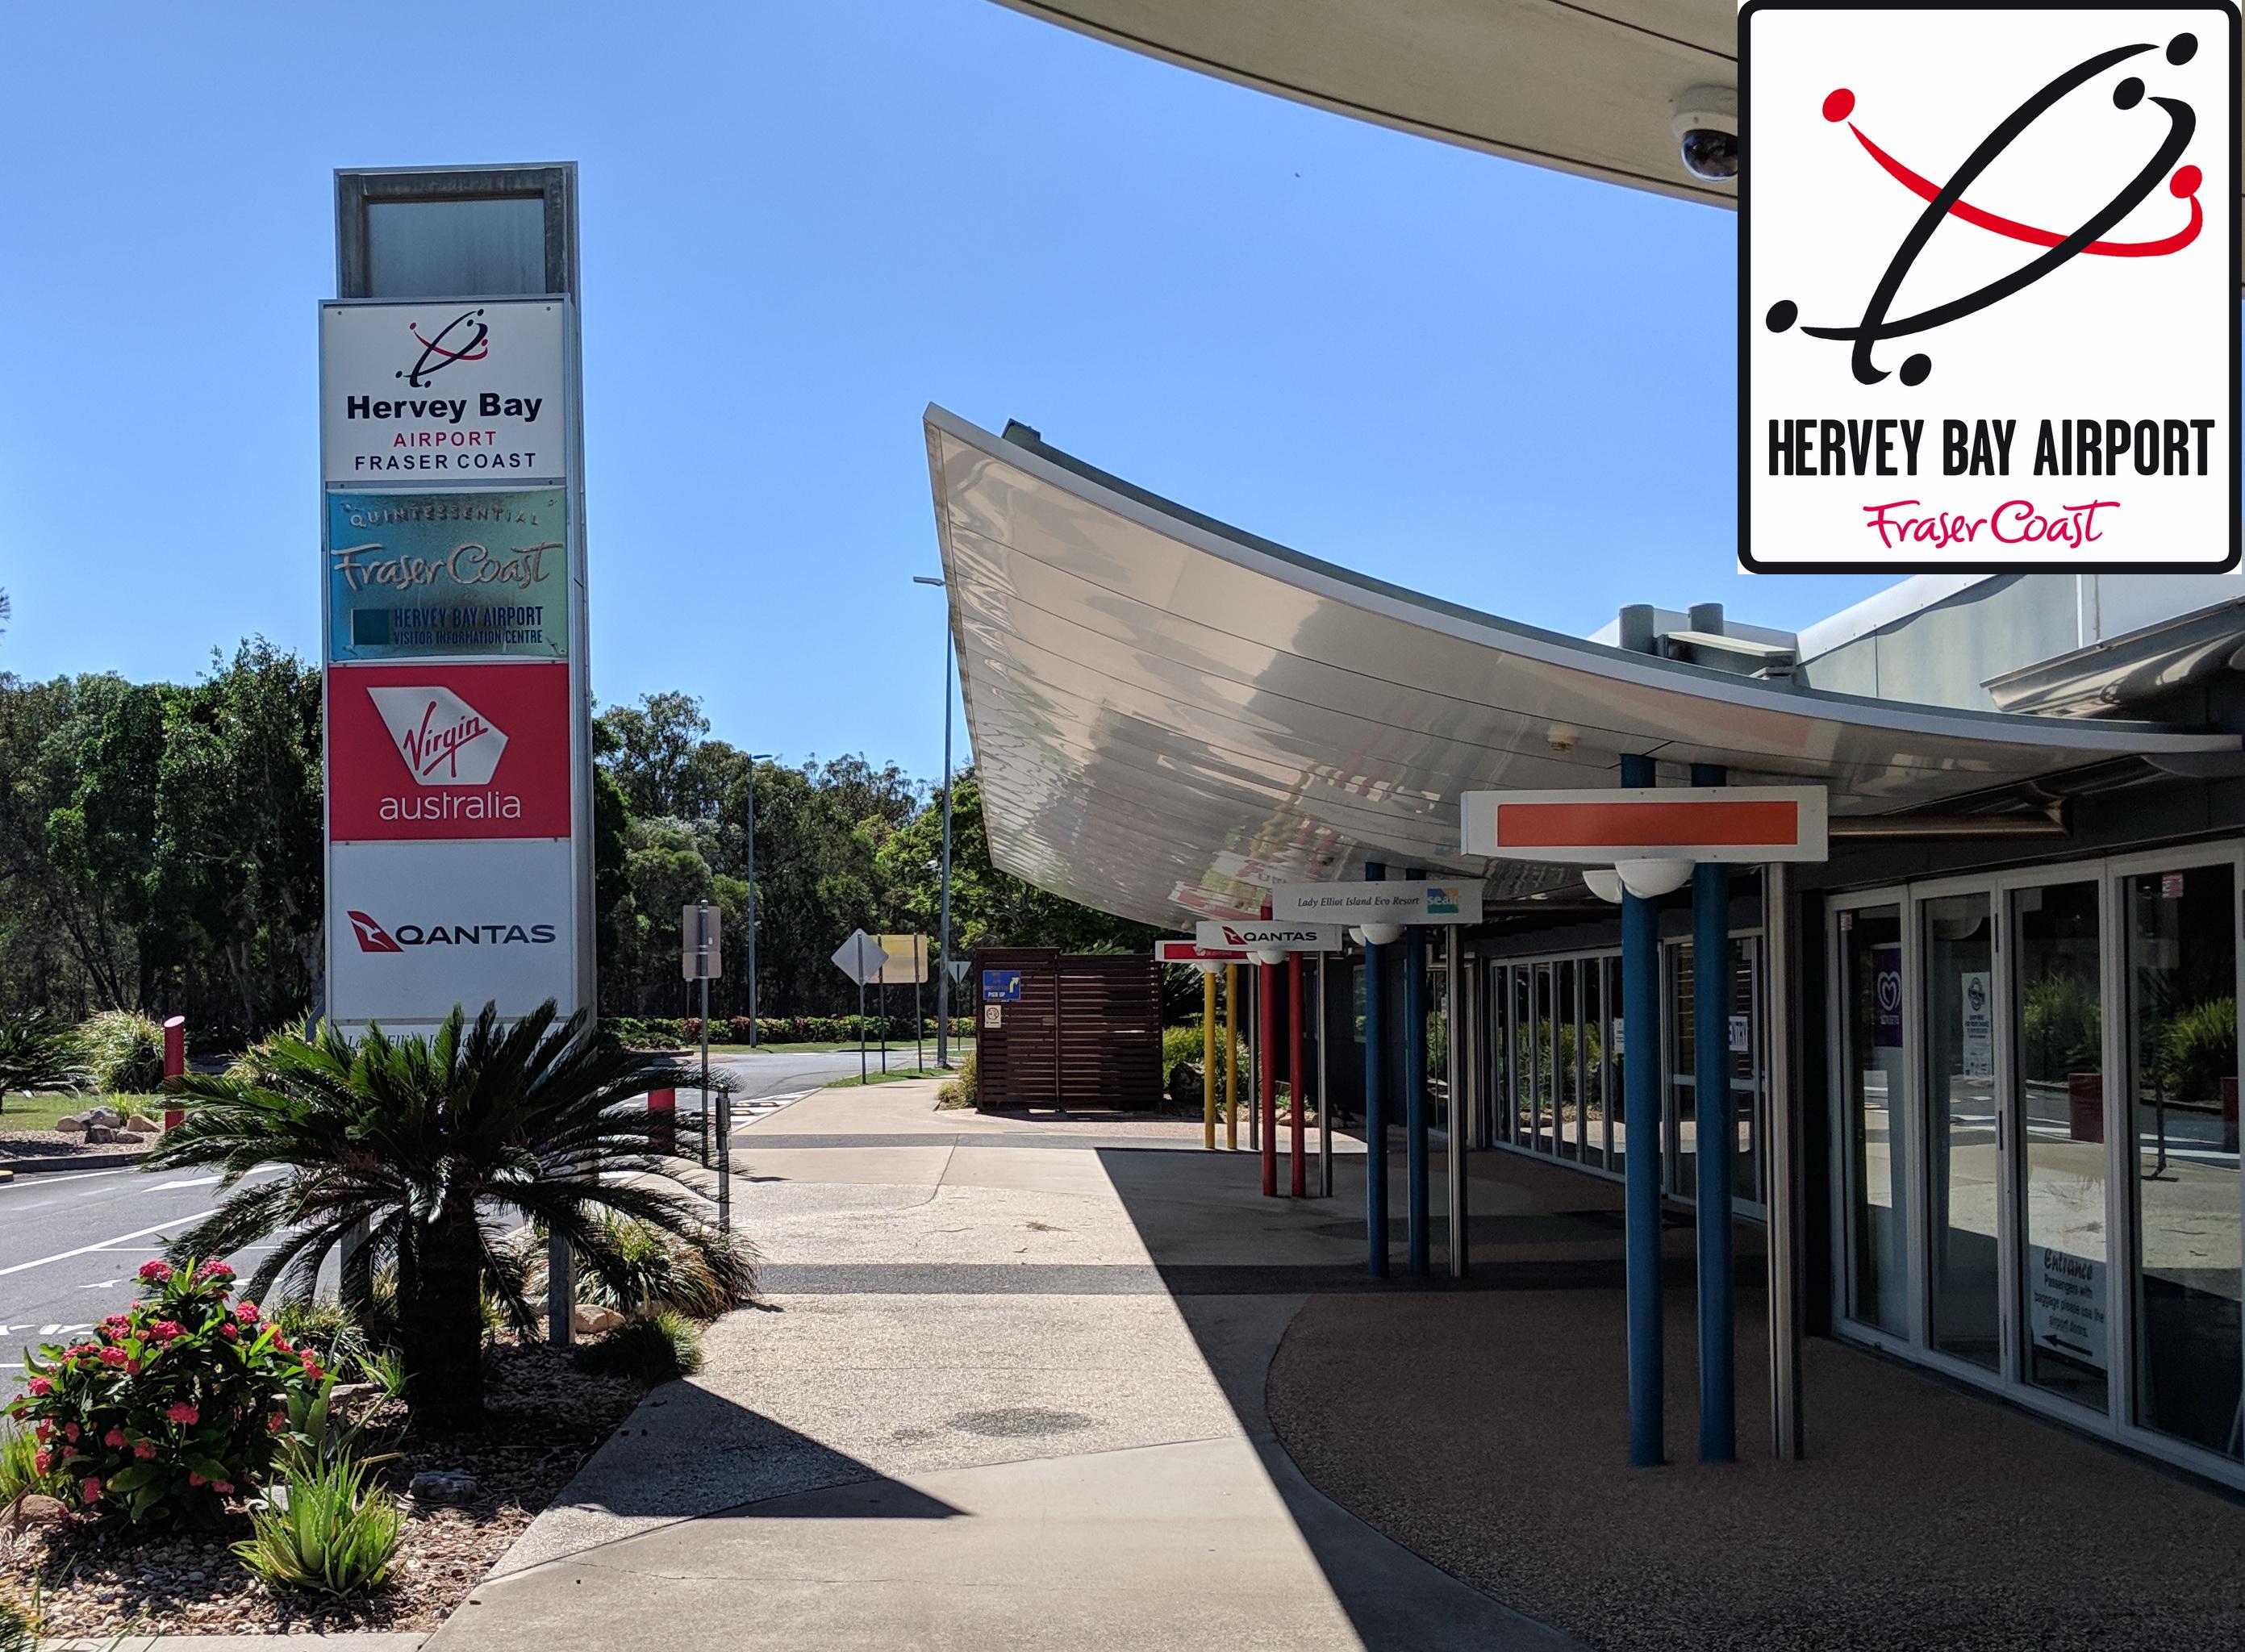 Hervey Bay Airport, Fraser Coast Queensland Australia